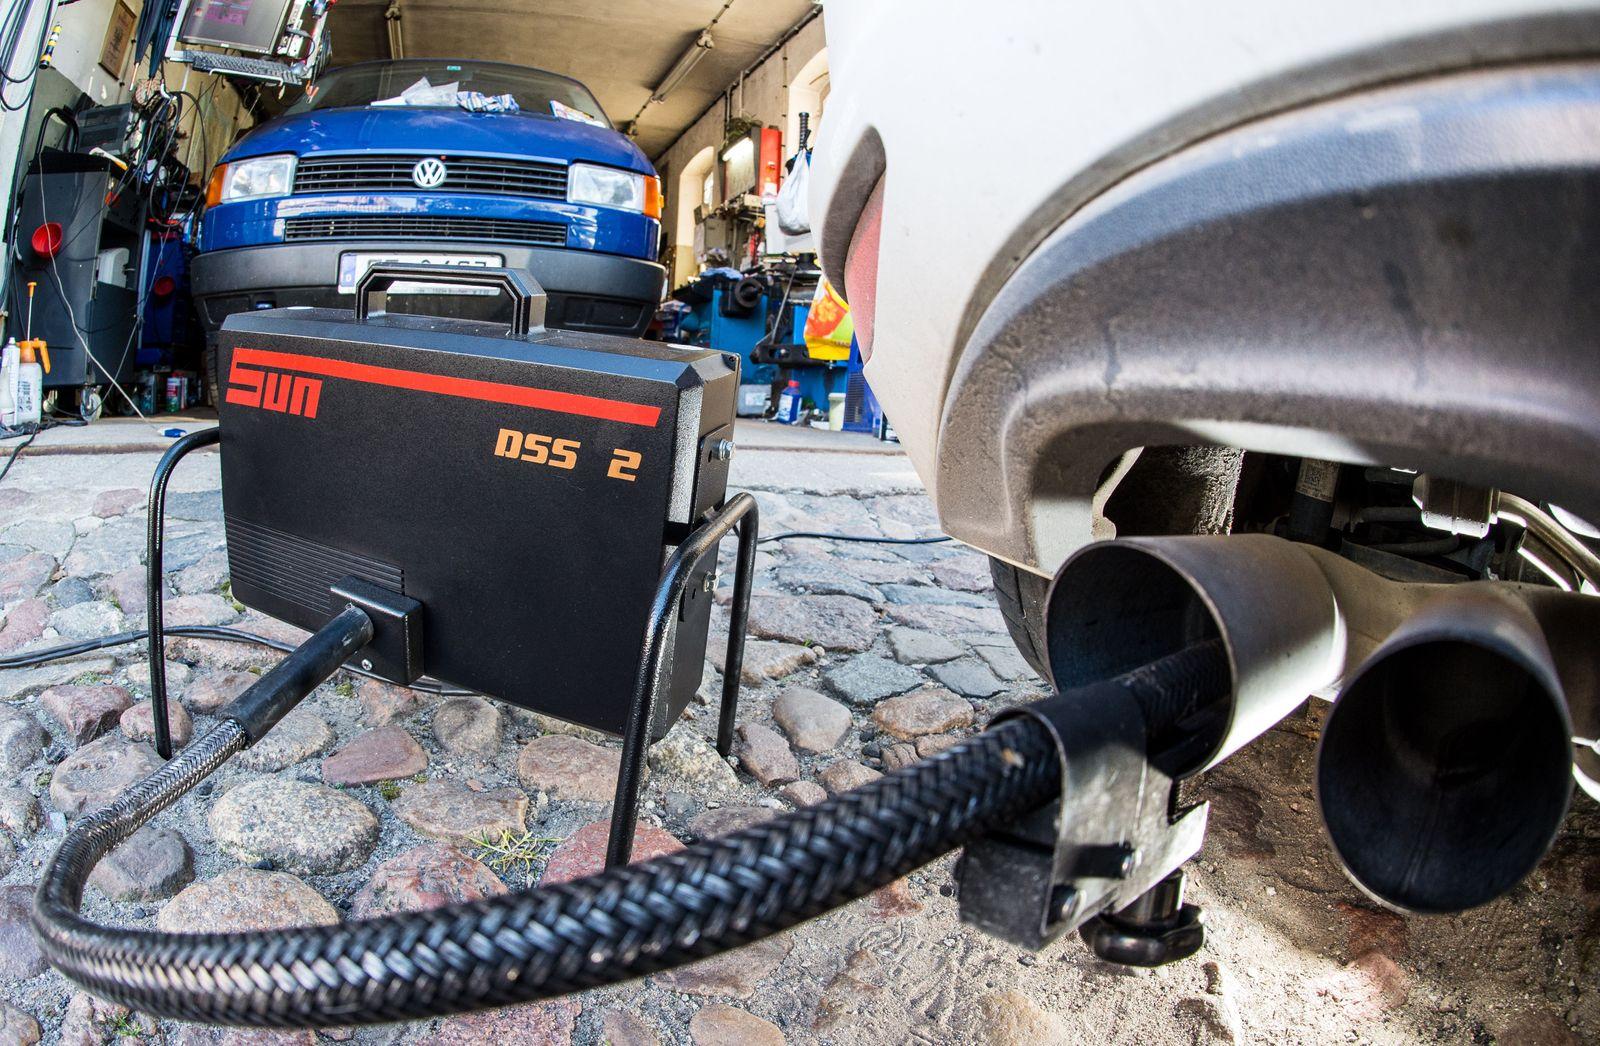 Abgasuntersuchung bei Dieselfahrzeug